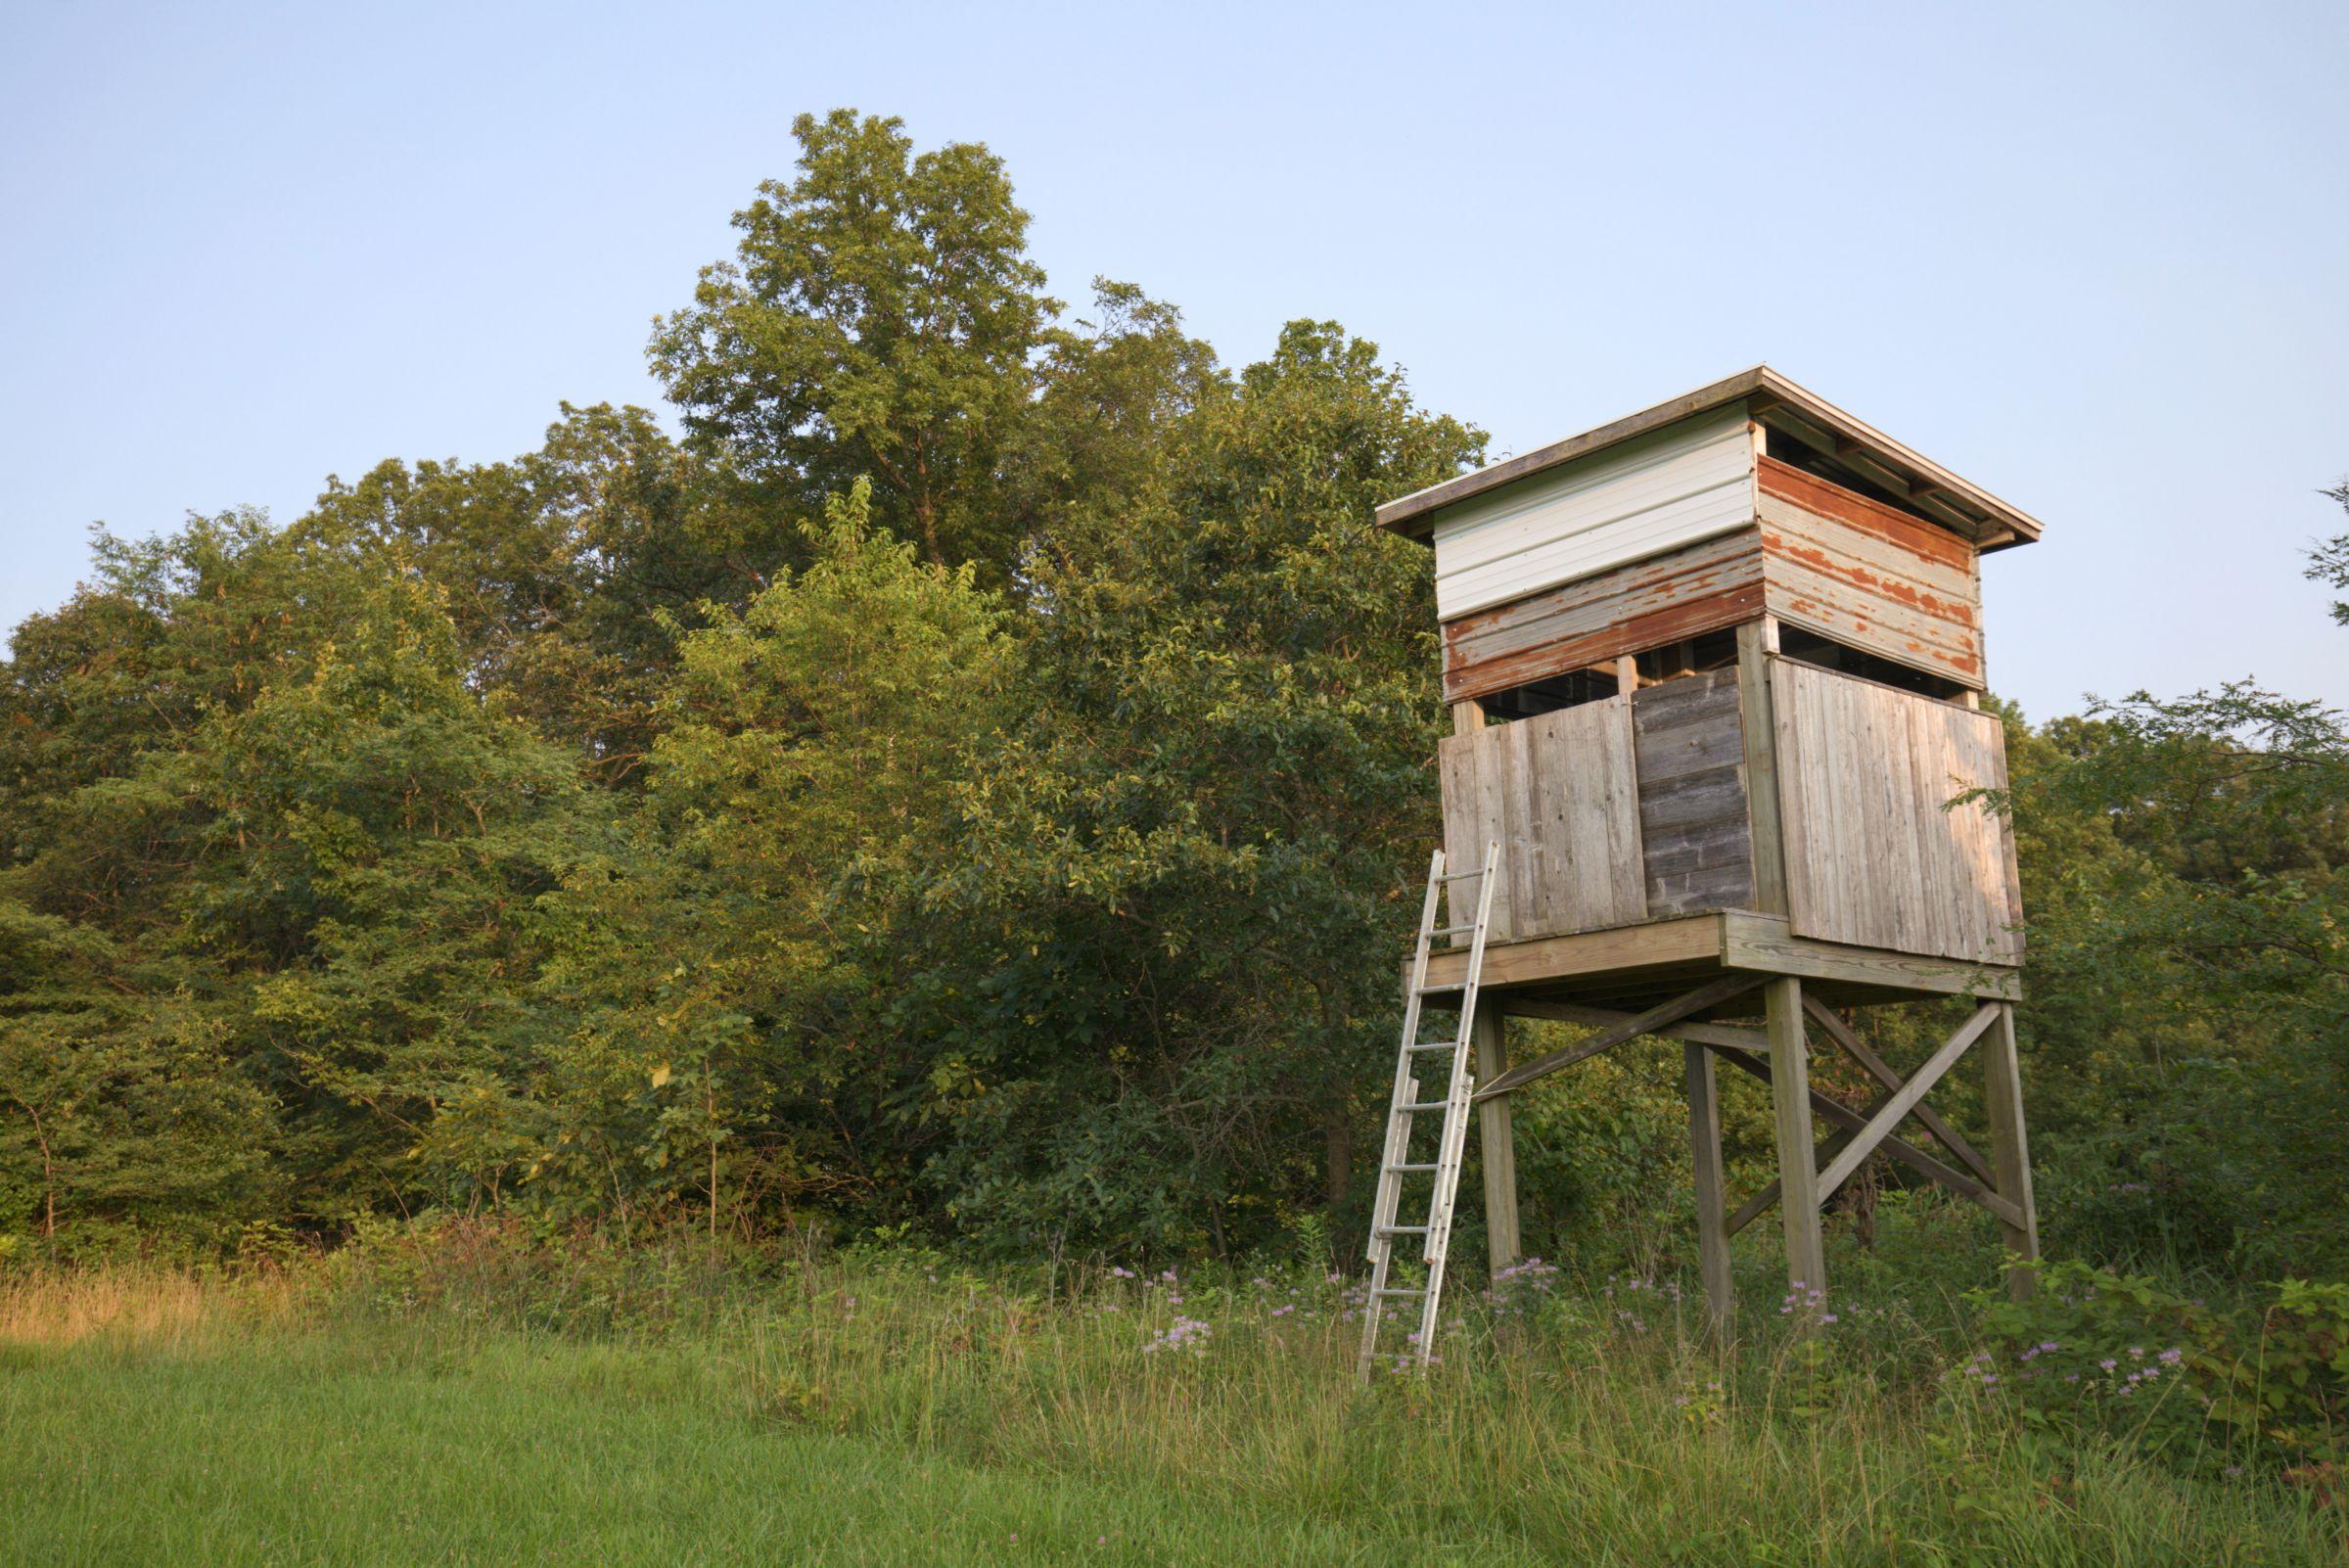 land-lee-county-iowa-340-acres-listing-number-15649-2-2021-07-21-184745.jpg